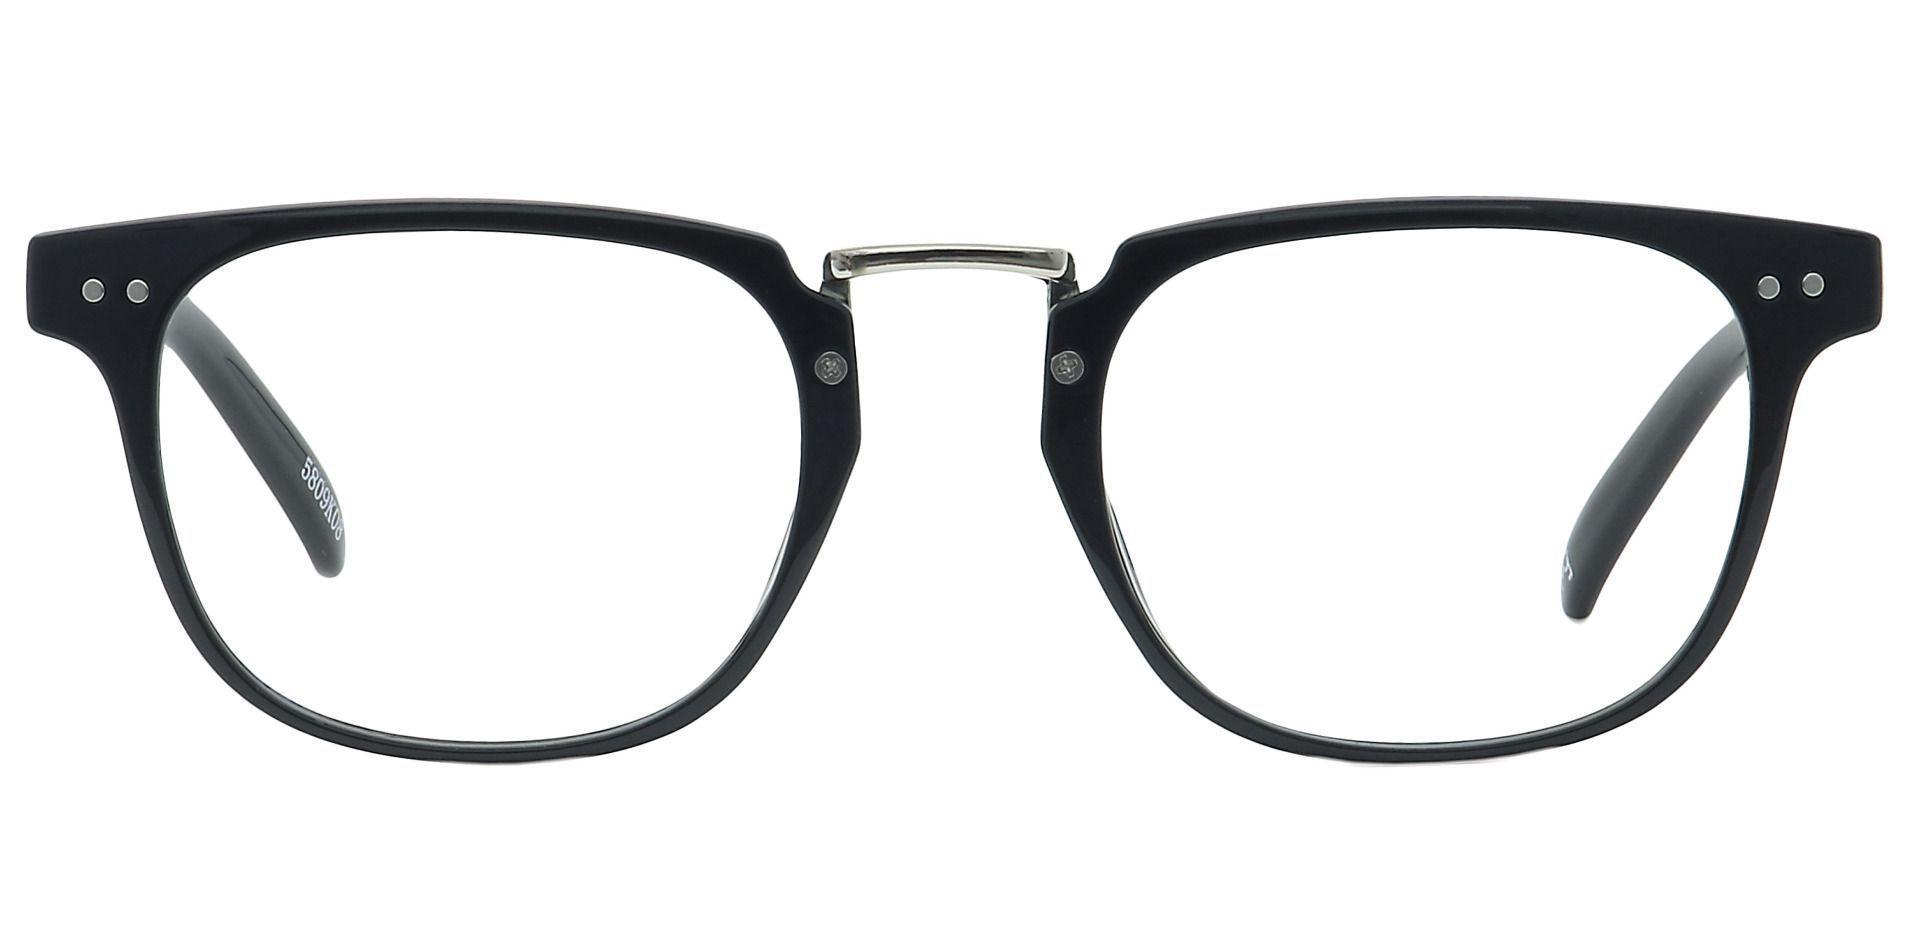 Smithton Oval Prescription Glasses - Black